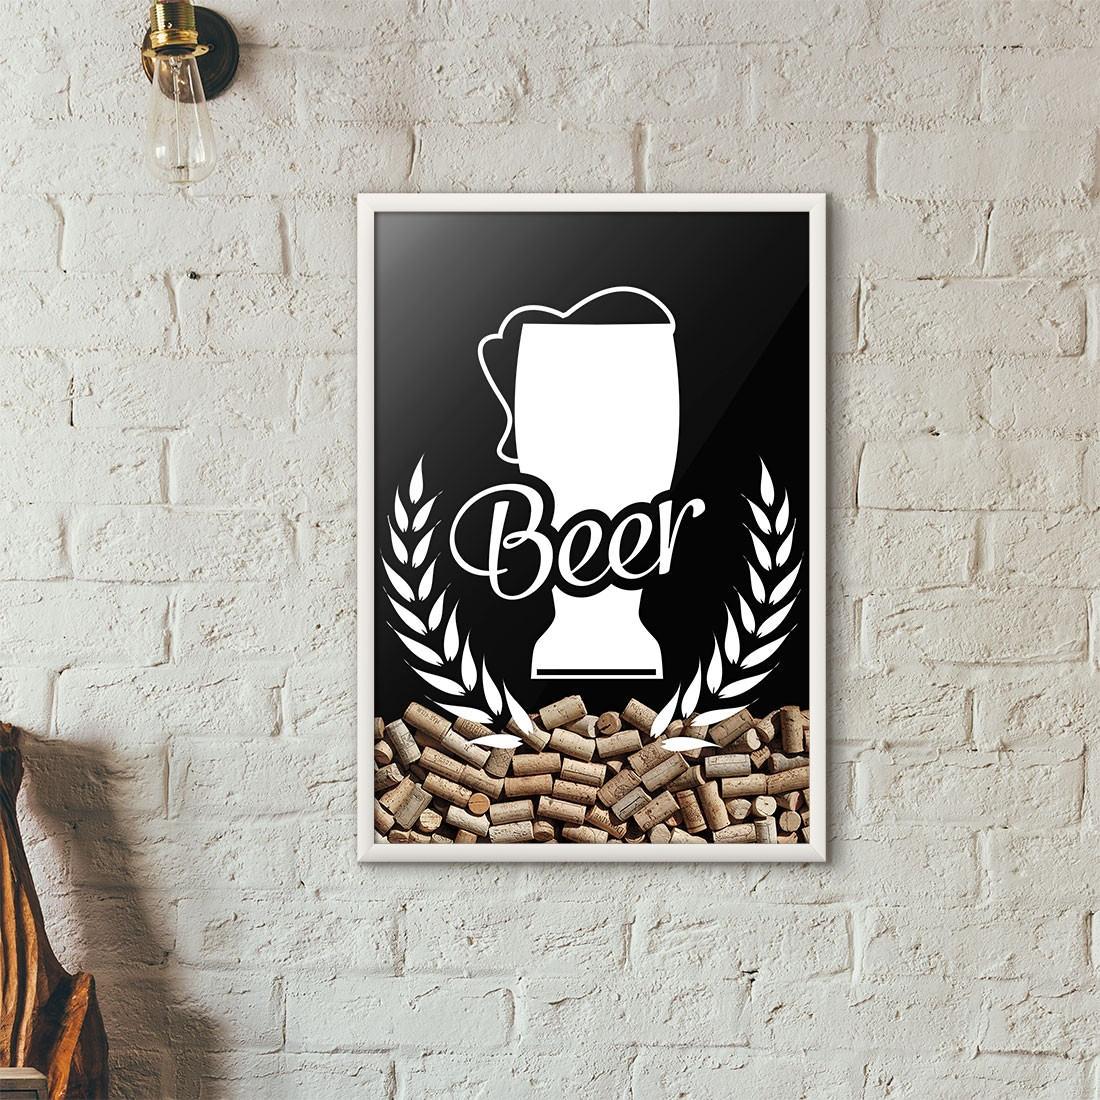 Quadro Porta Tampinhas de Cerveja - Tulipa Beer - (Moldura Branca)